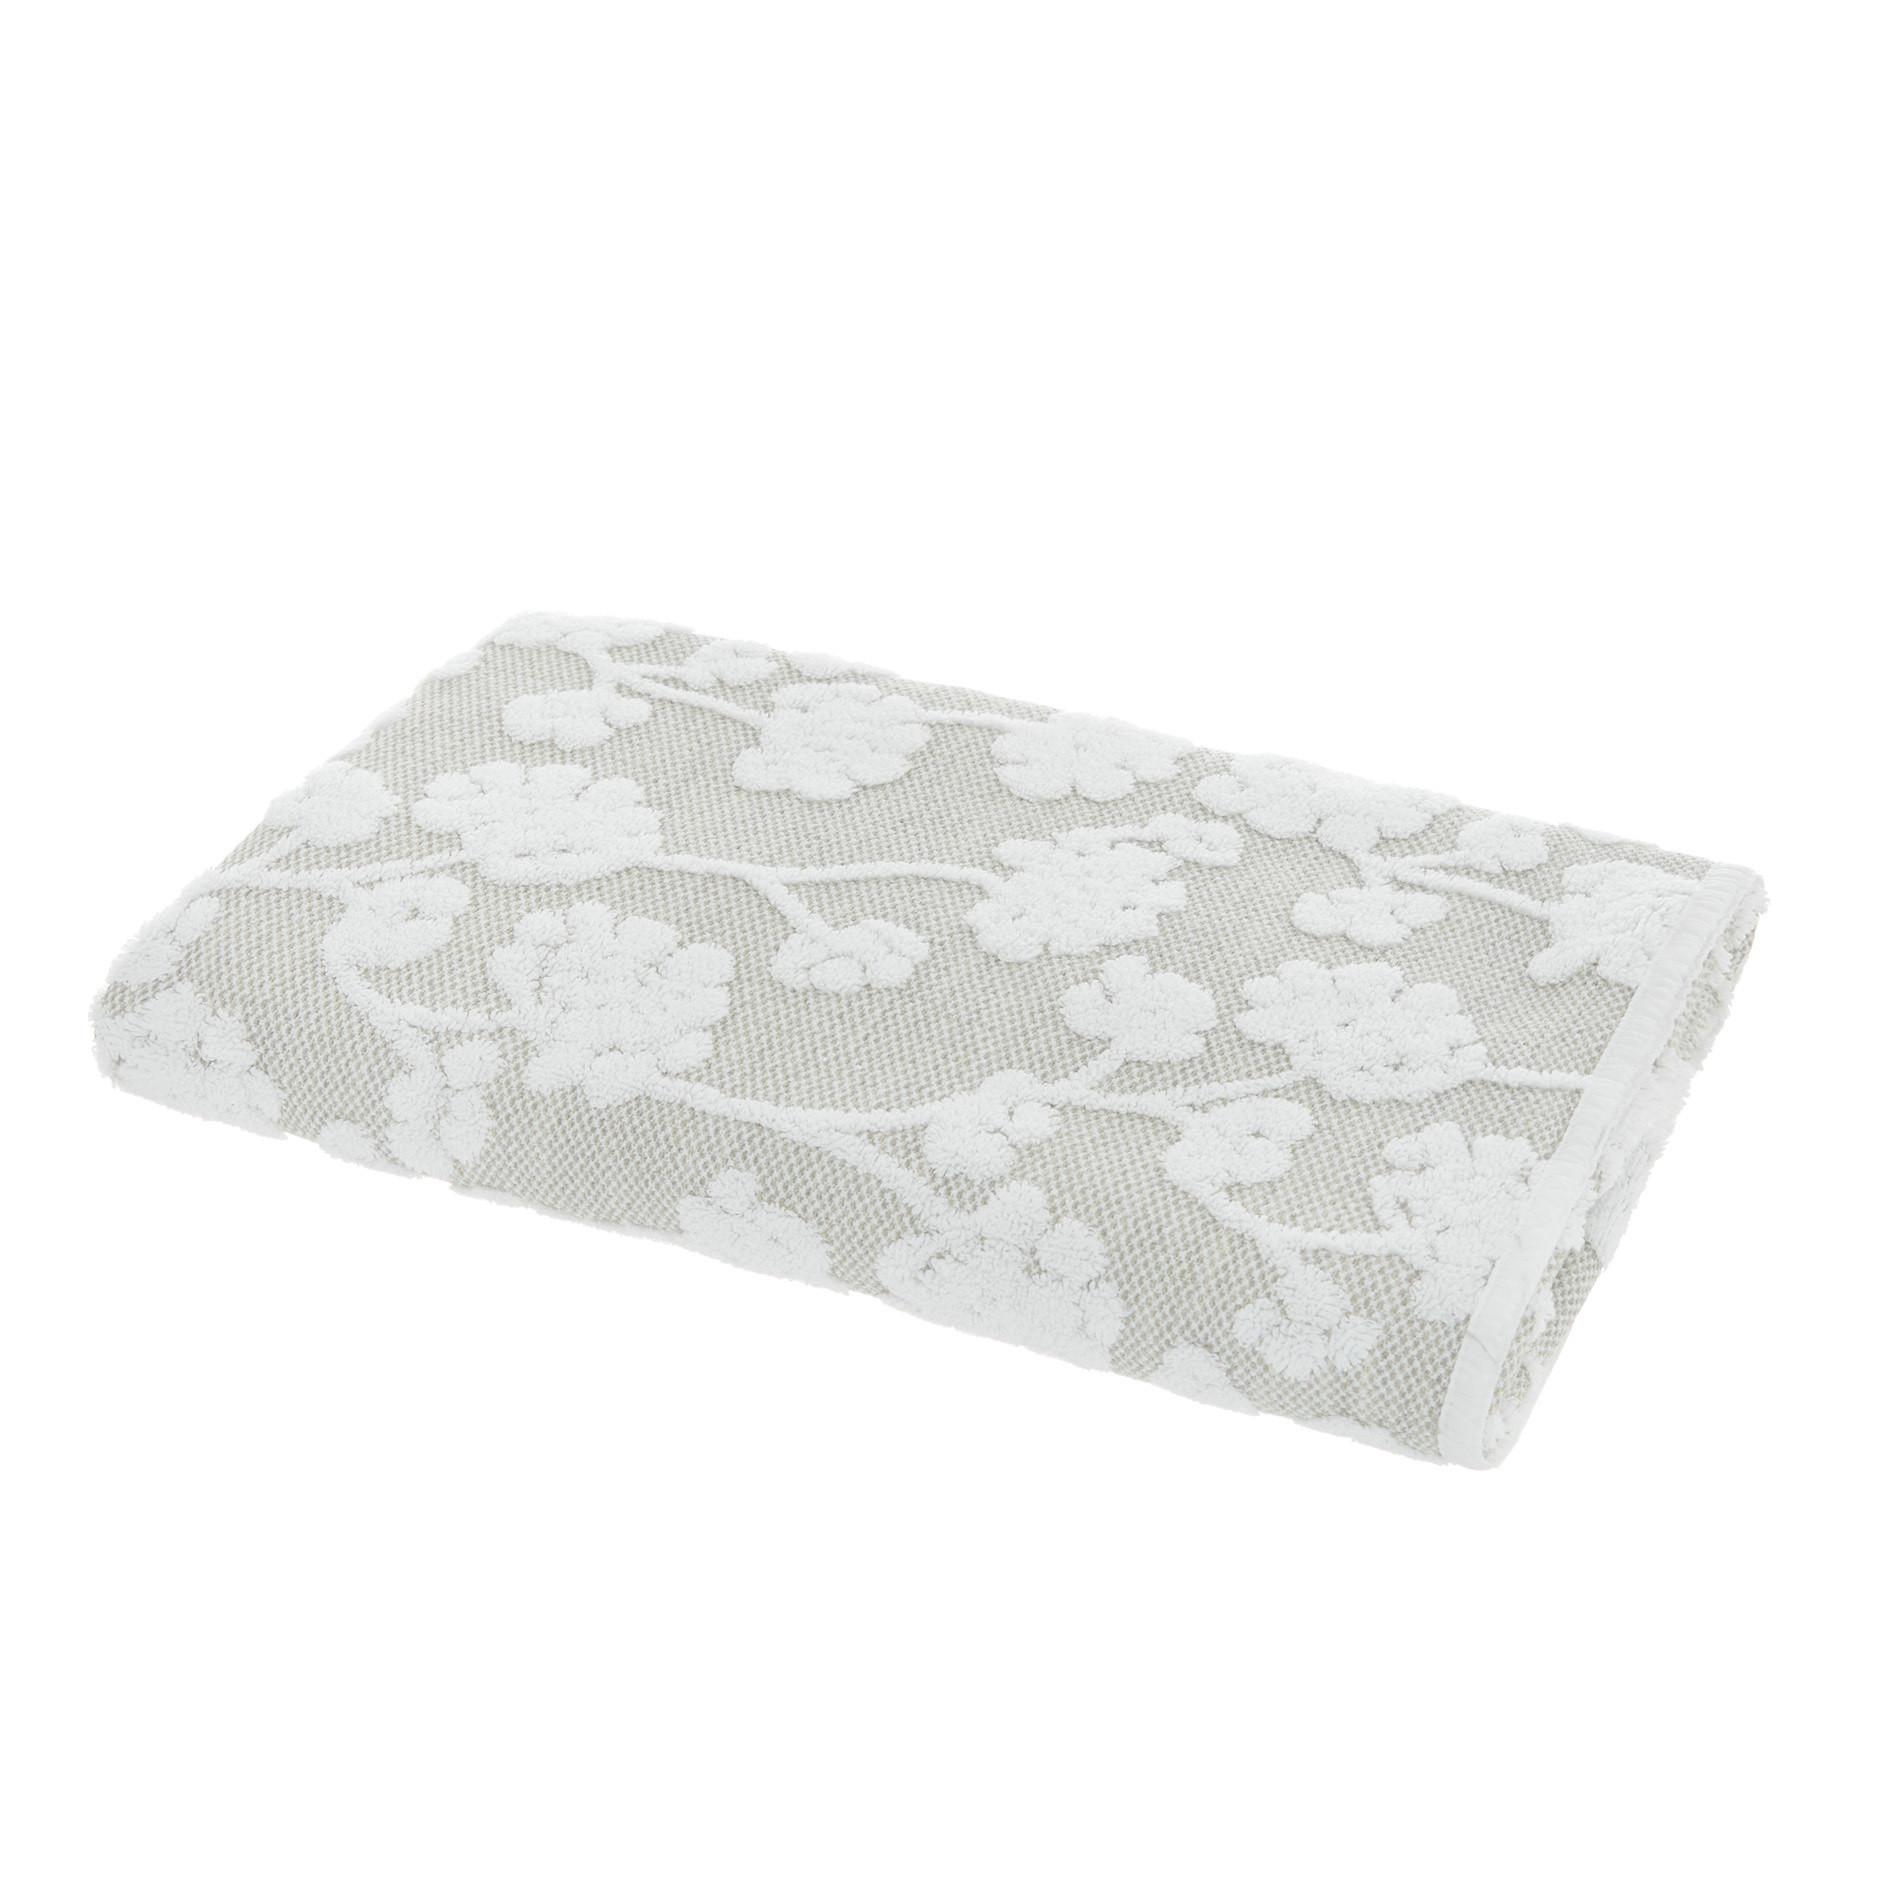 Asciugamano puro cotone a fiori Thermae, Beige chiaro, large image number 1